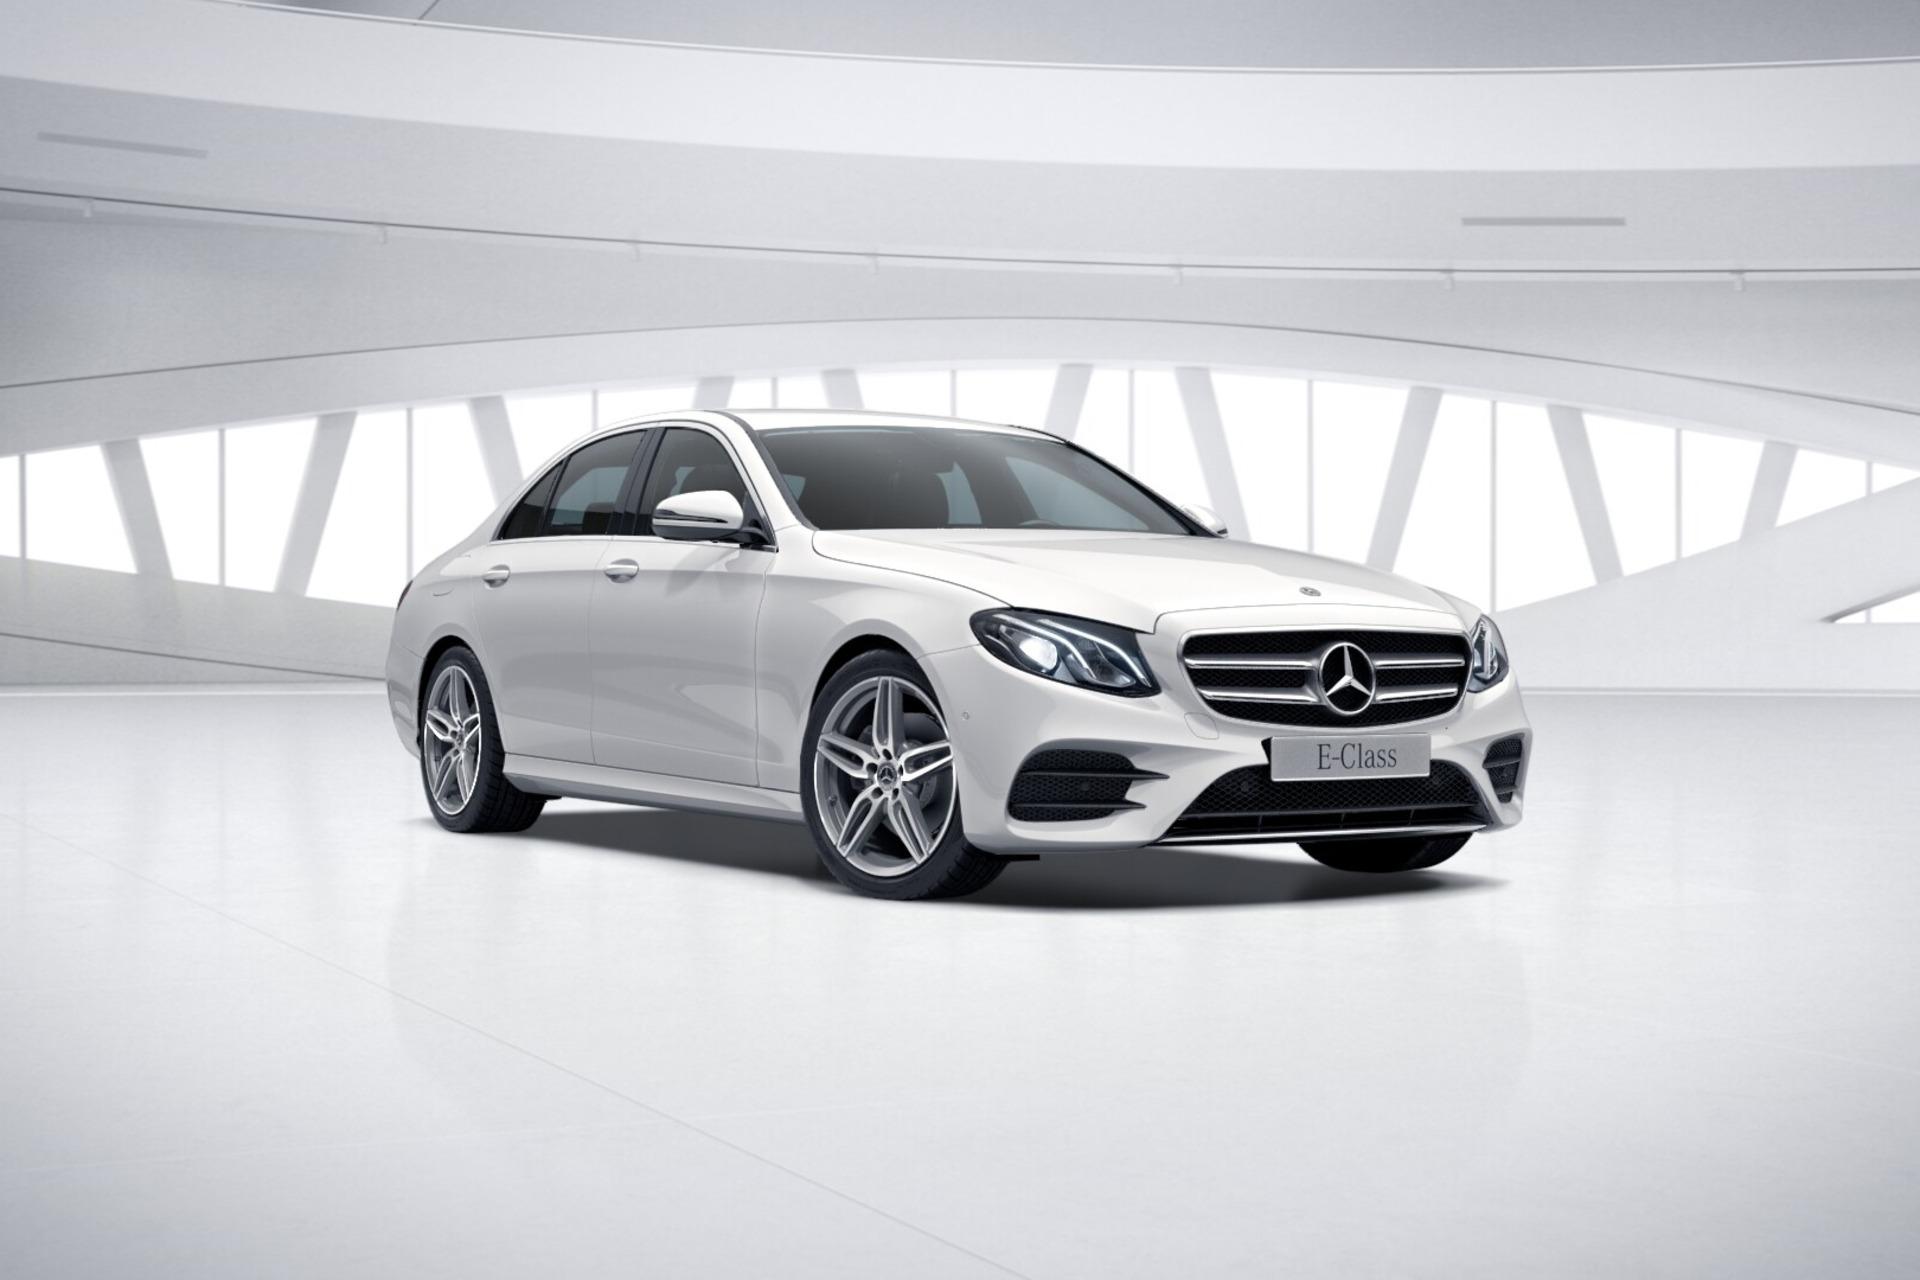 Mercedes-Benz E-Class Limousine 952611388